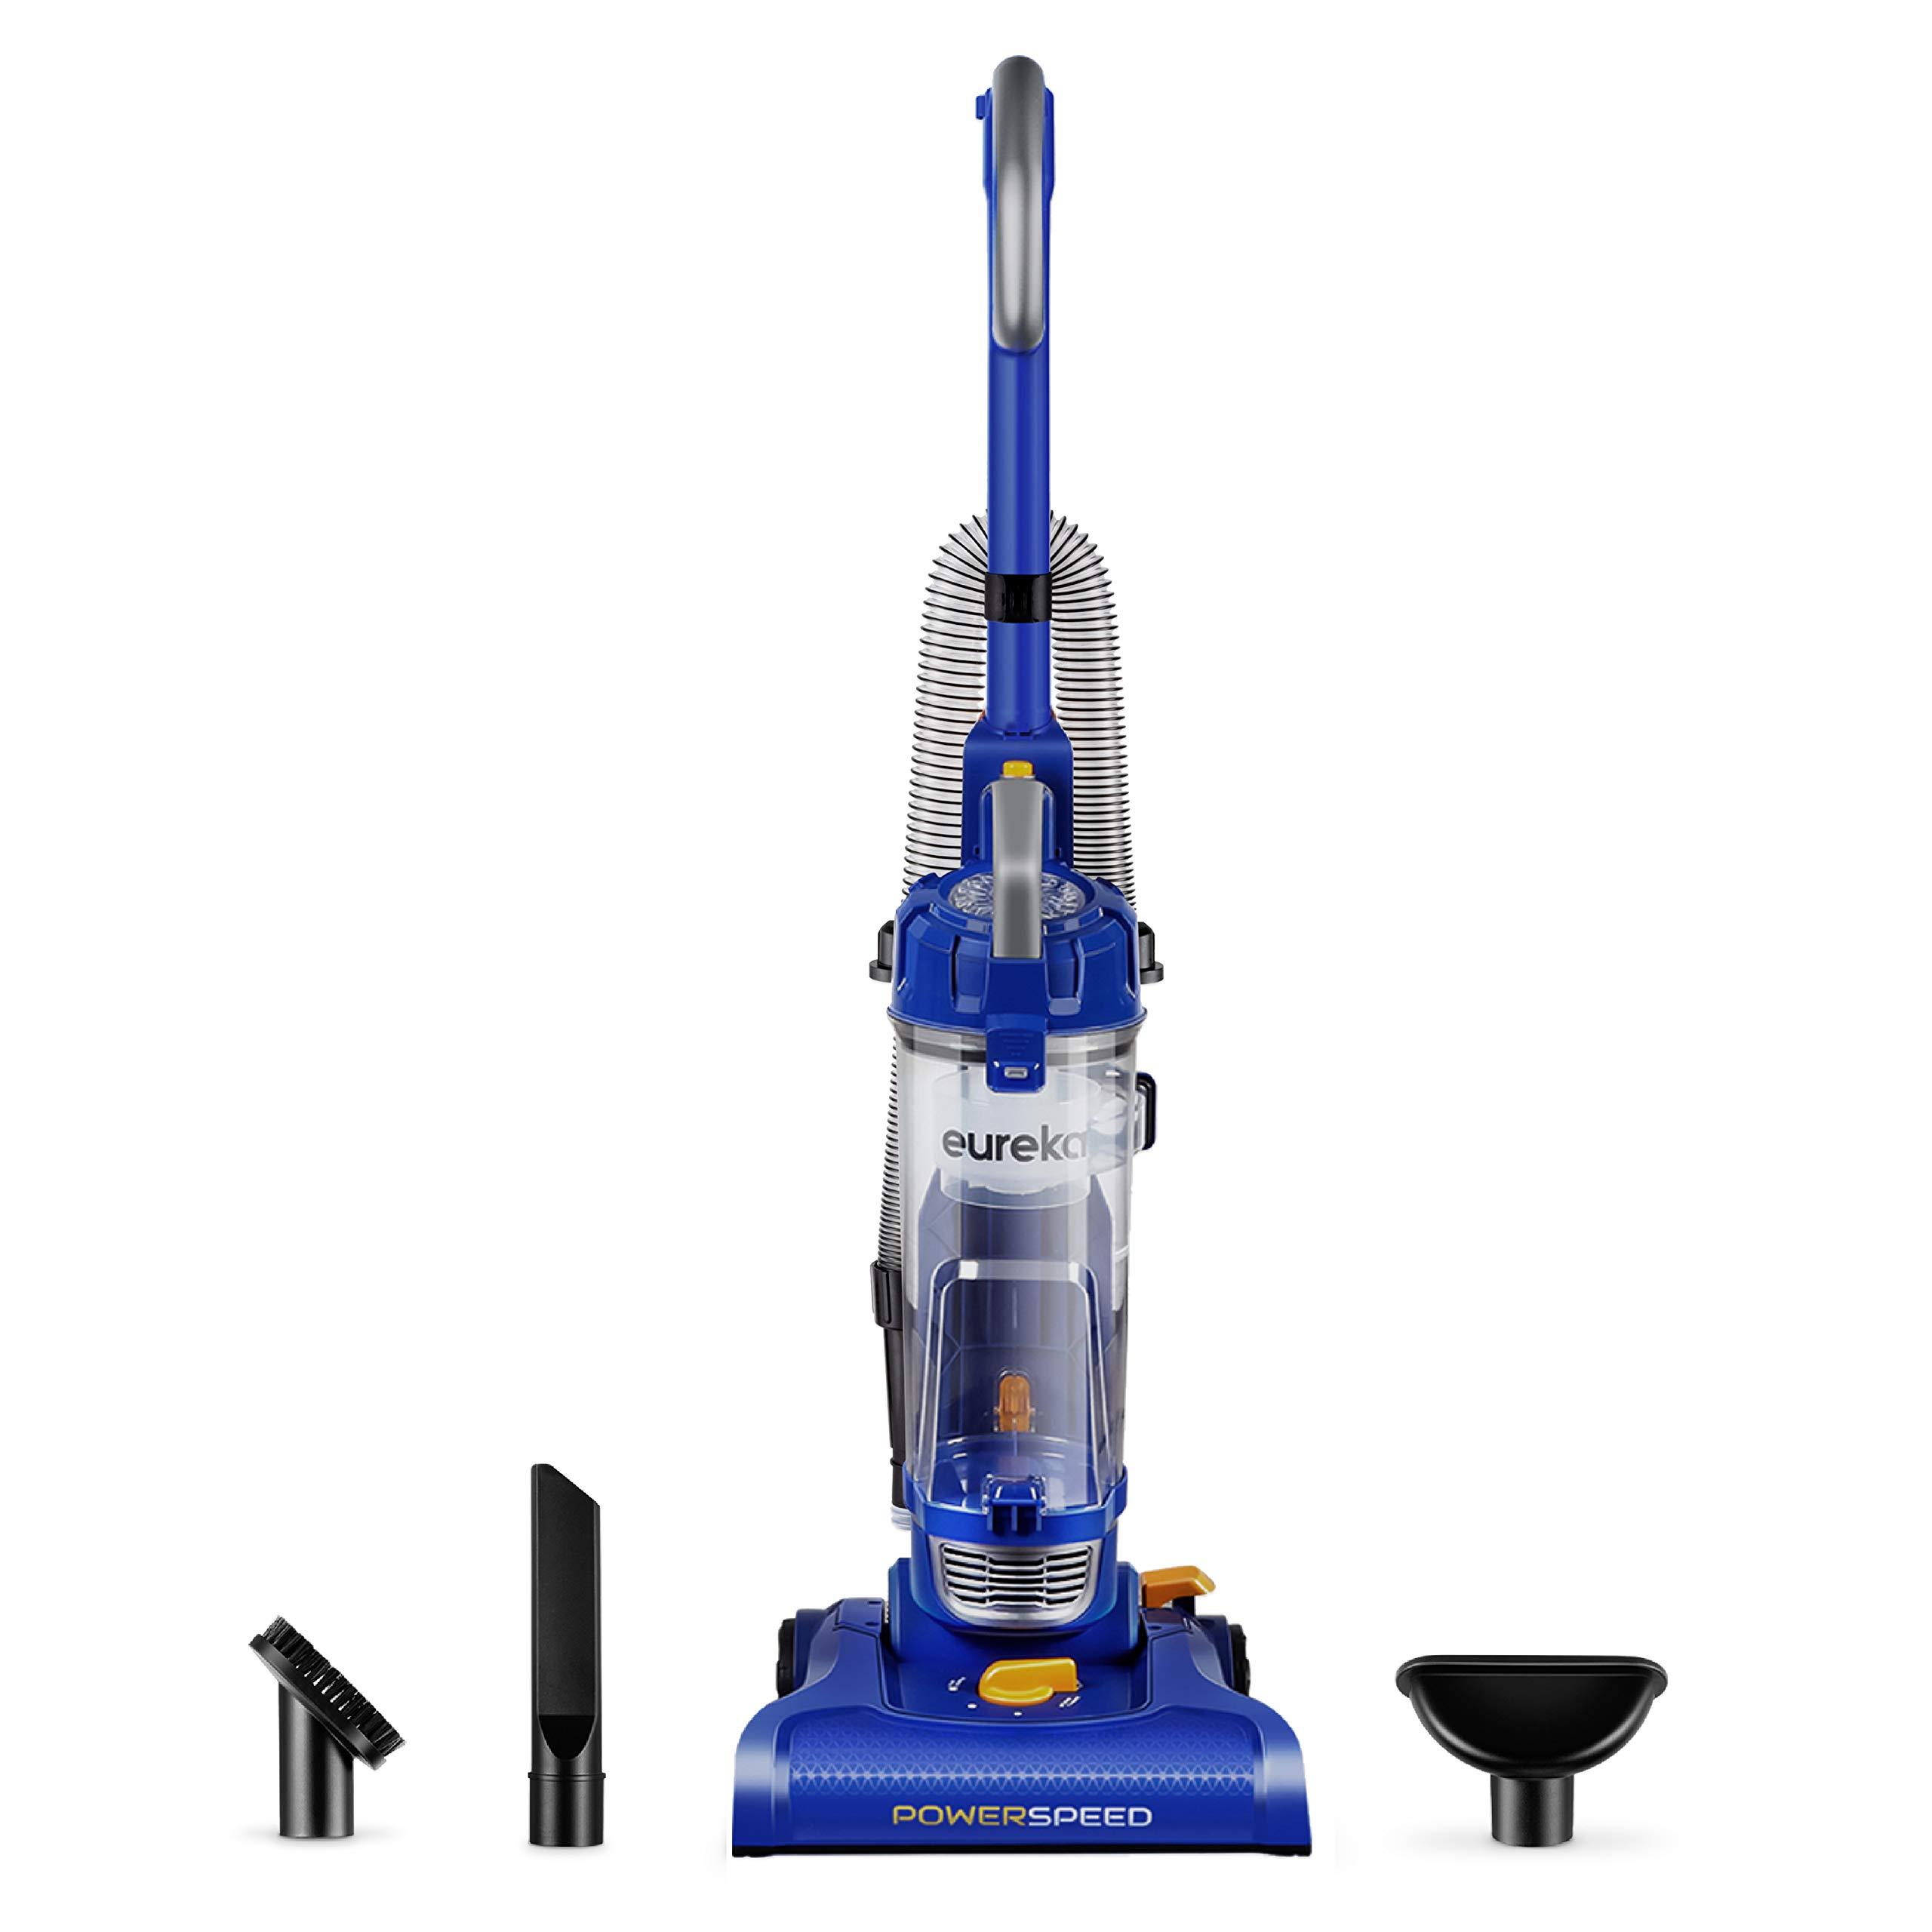 Eureka NEU182A PowerSpeed Lightweight Bagless Upright Vacuum Cleaner, Blue, Lite, Indigo by EUREKA